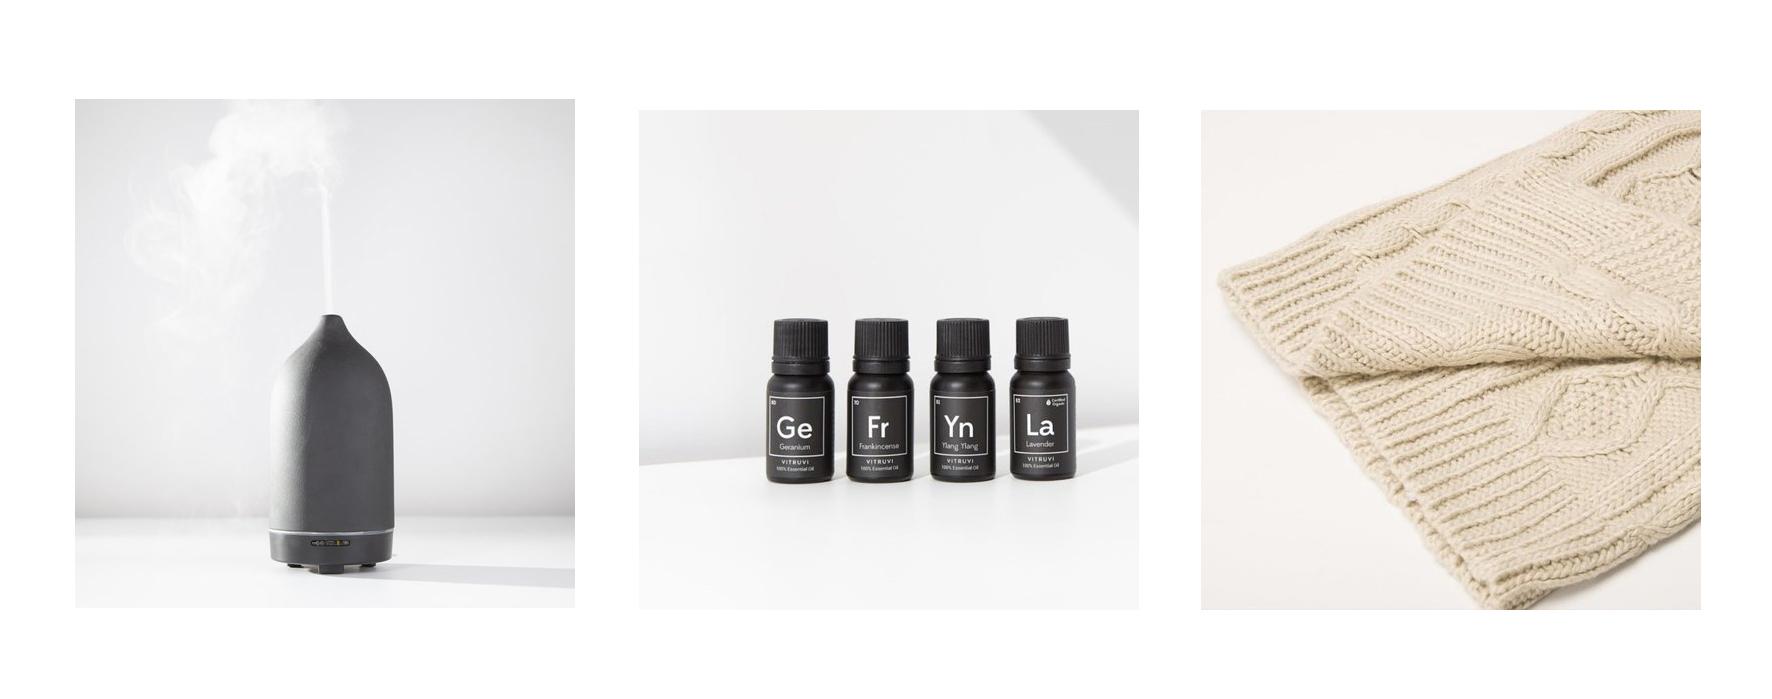 Vitruvi Diffuser, Essential Oils (2bottles), Battio Blanket